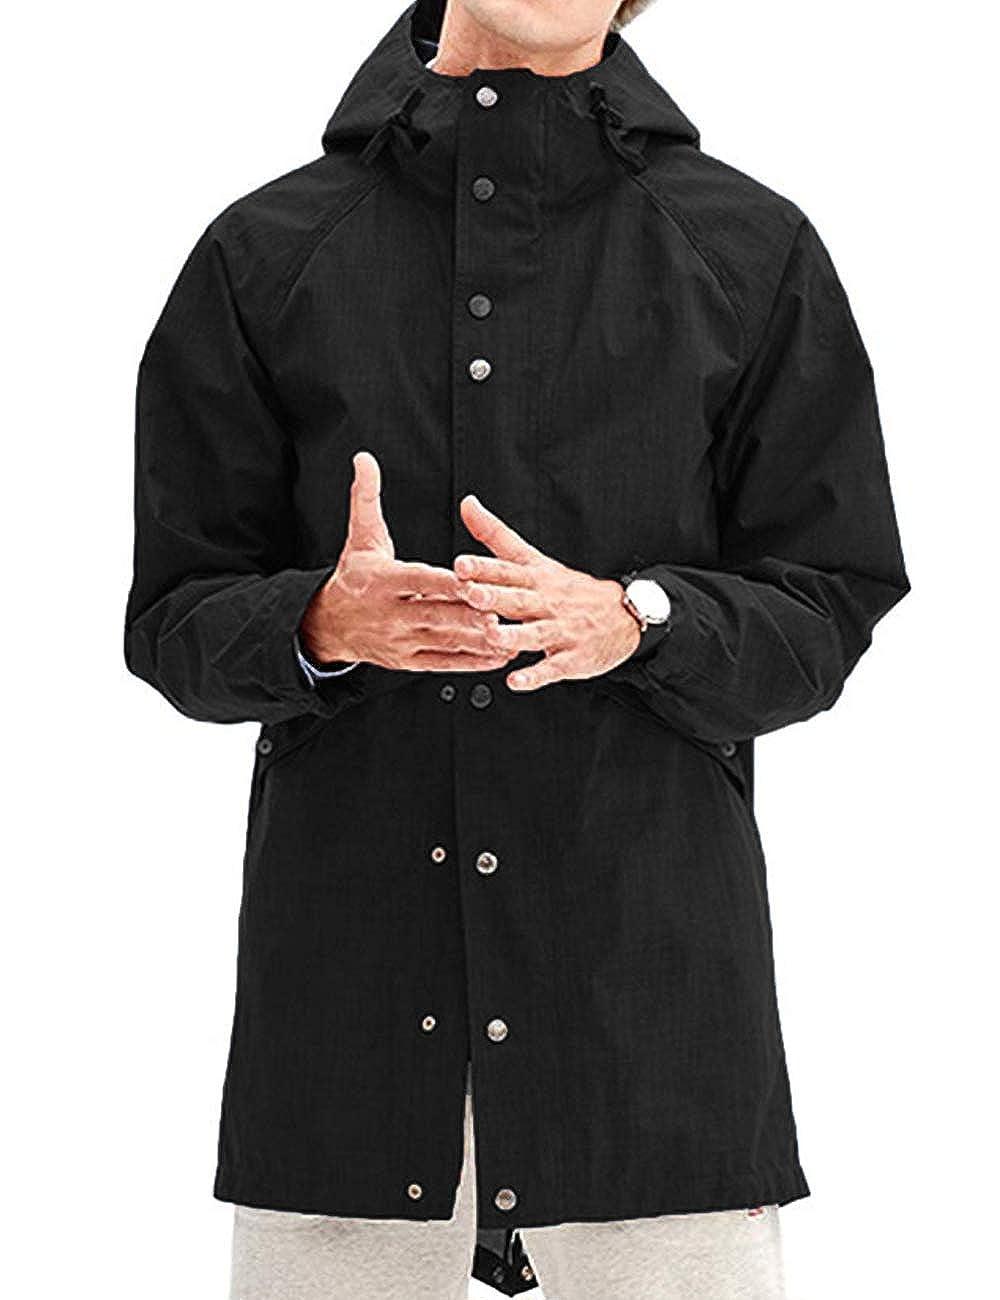 poriff Herren Regenjacke wasserdicht mit Kapuze Lange Multi Jacke Urban Outdoor